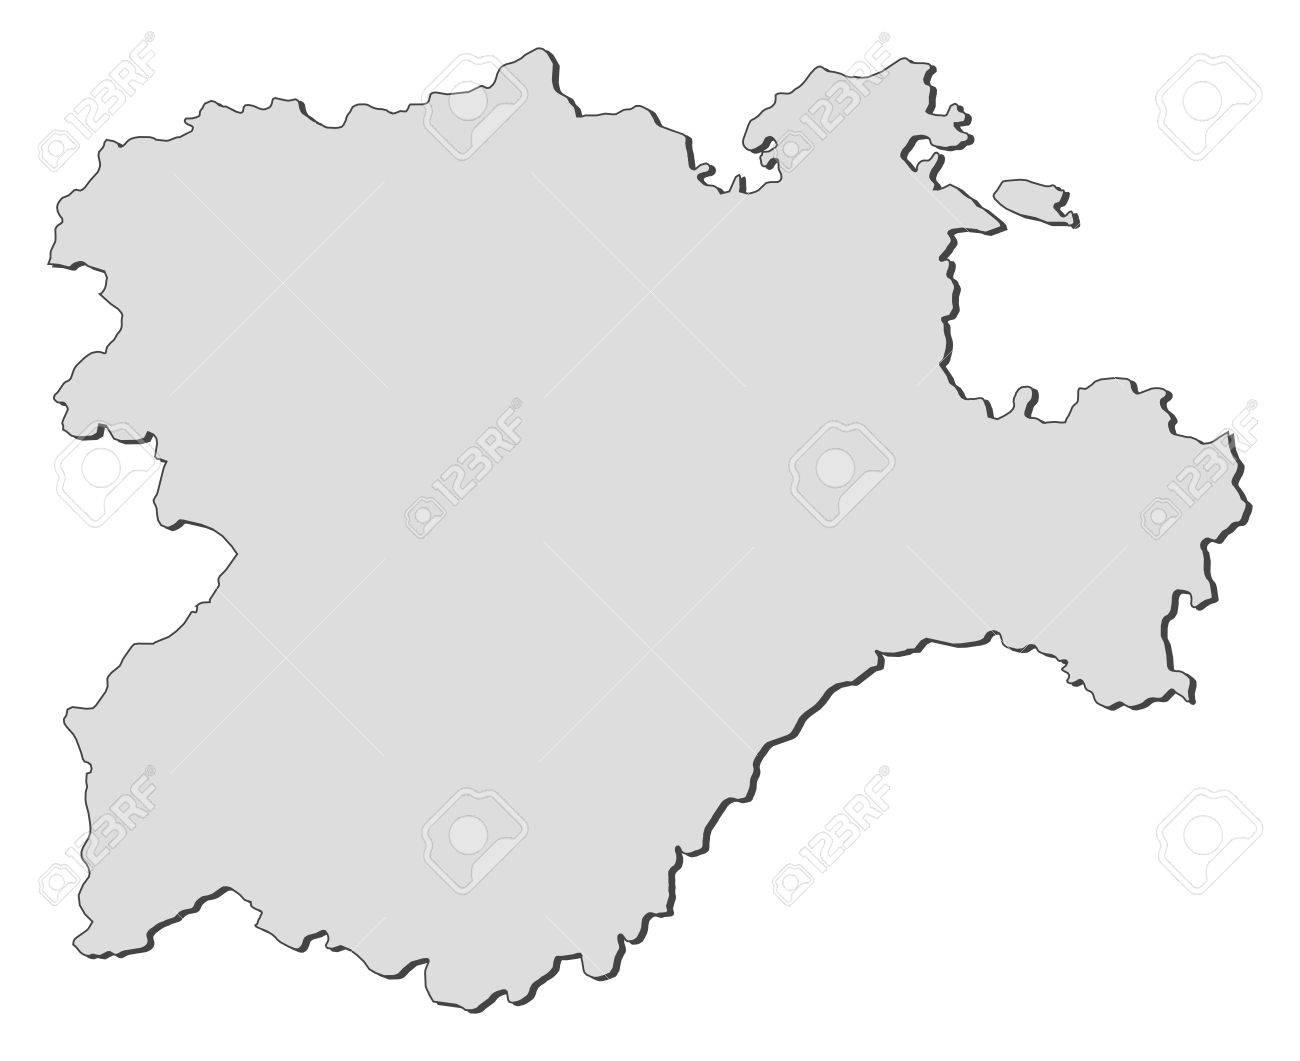 Map of Castile and Leoacuten, a region of Spain. Stock Vector - 14415030